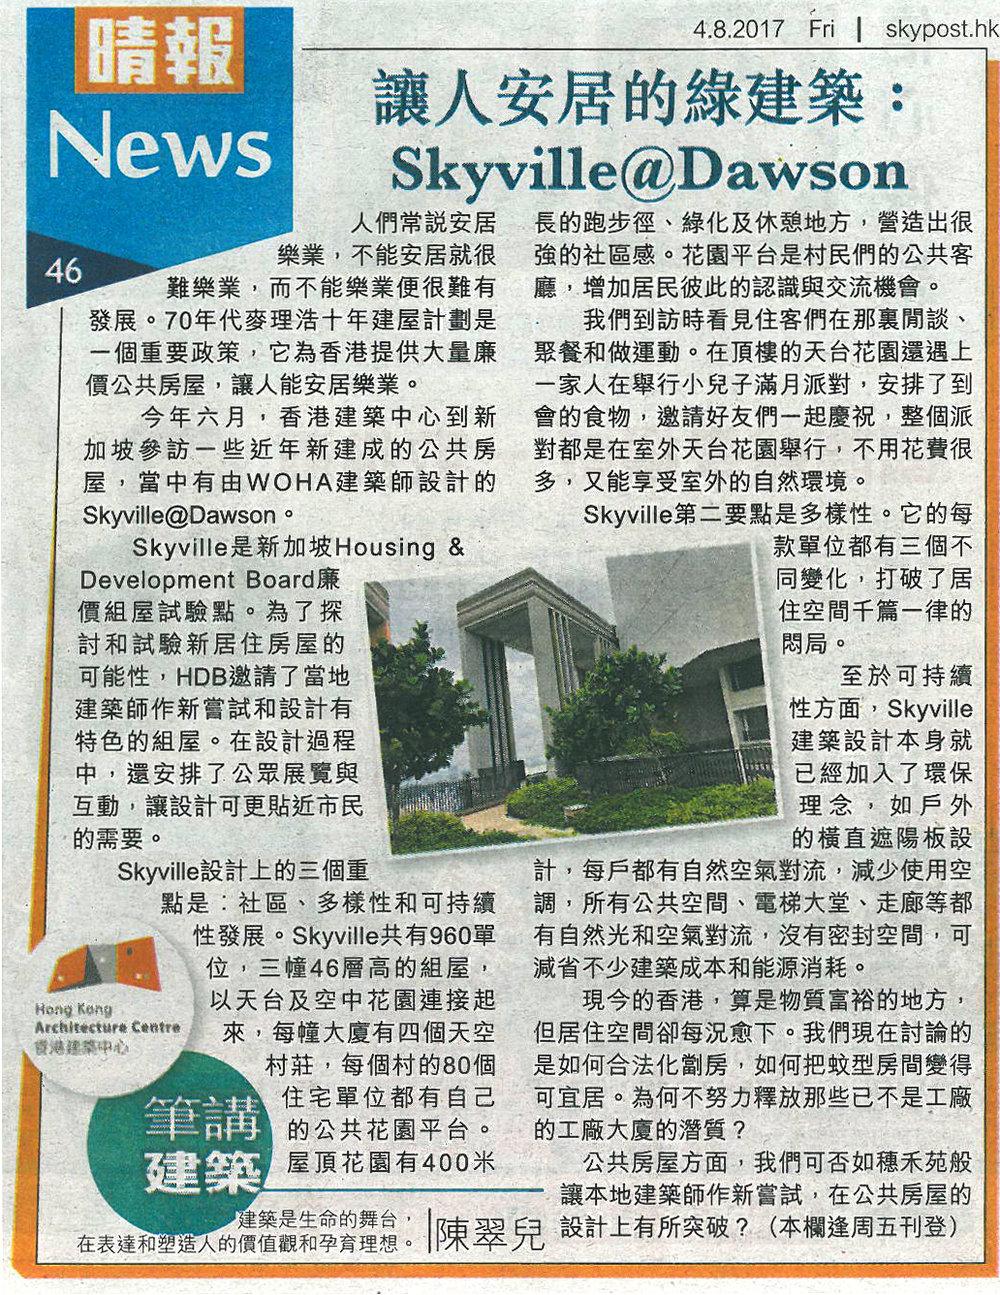 Skypost_170804_陳翠兒_讓人安居的綠建築:Skyville@Dawson.jpg